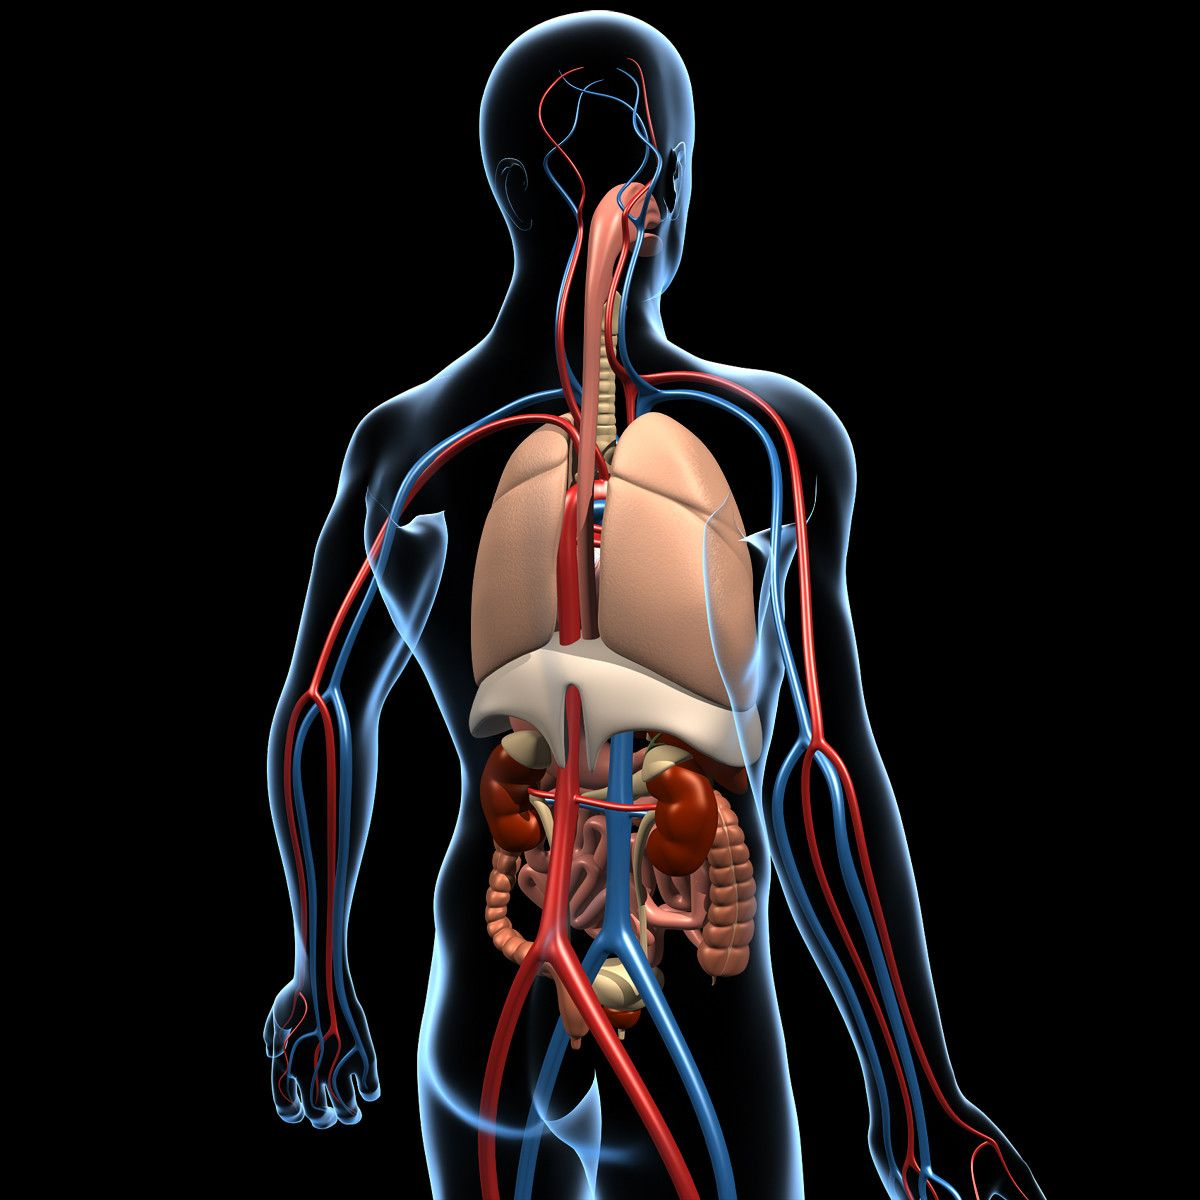 Human Anatomy 3d Model Pinterest Human Anatomy 3d And